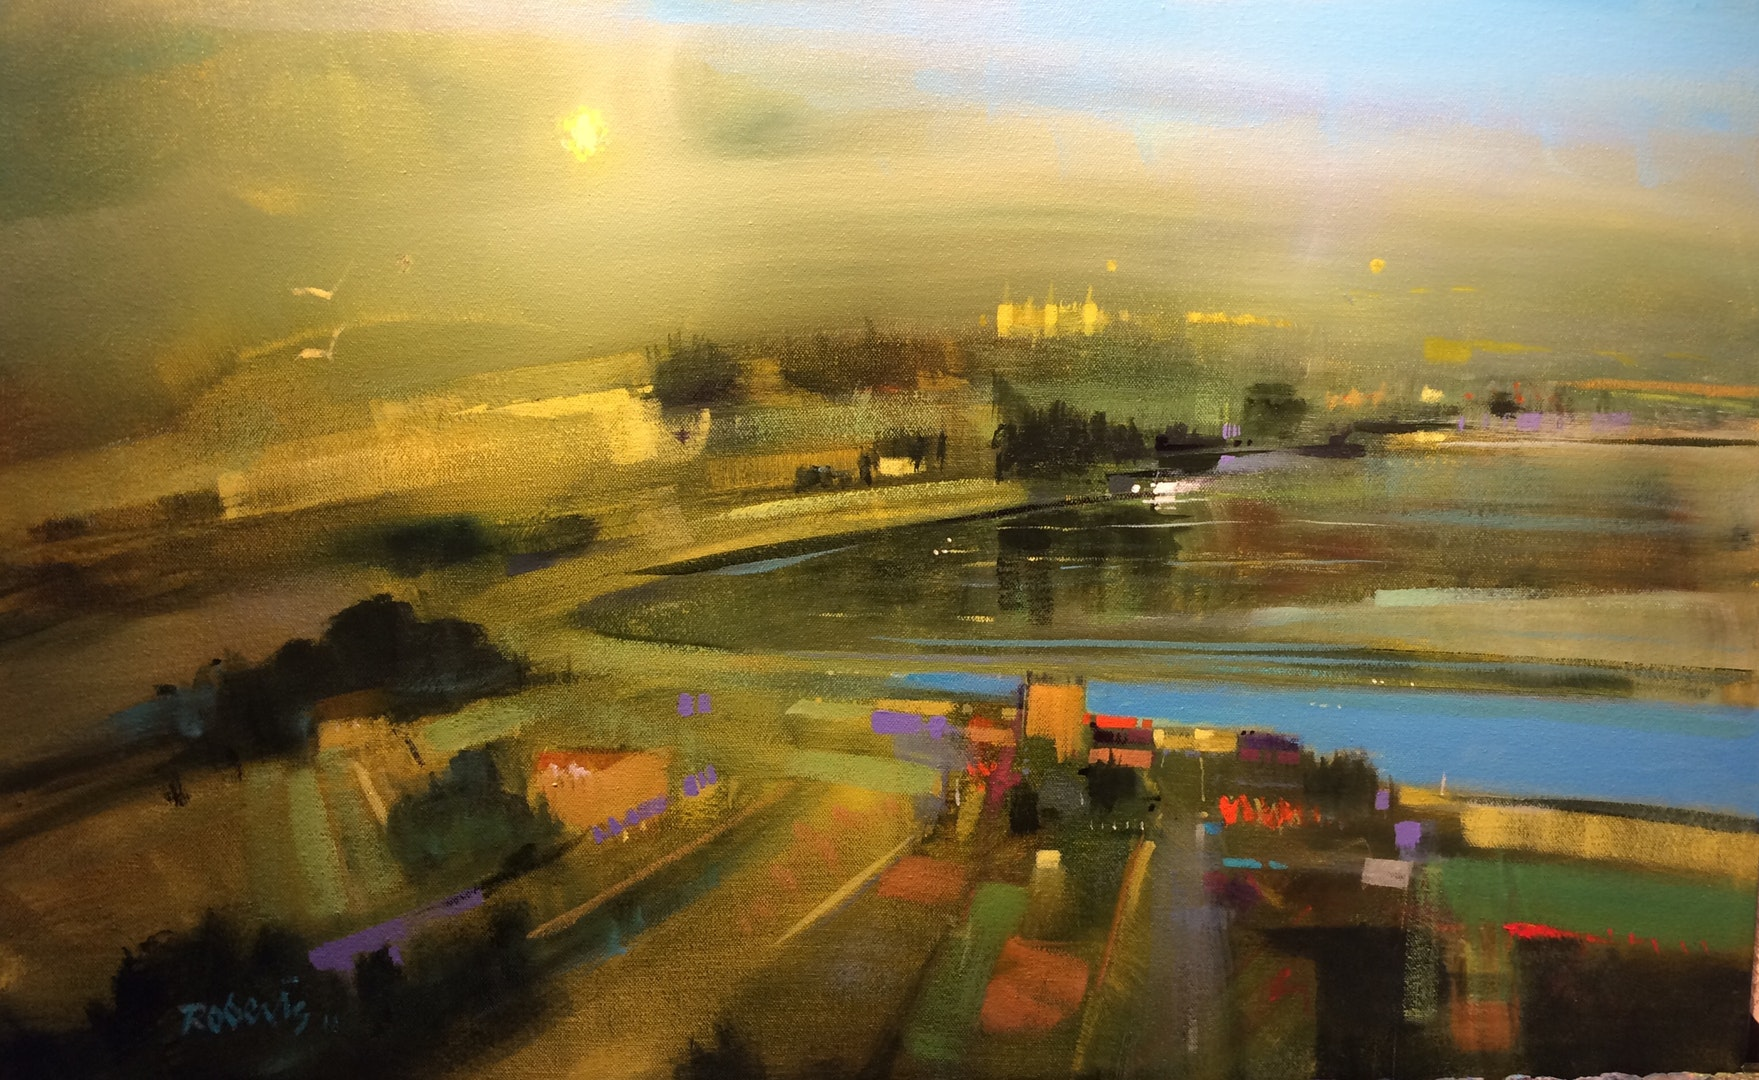 Ken Roberts  Mist Over Tigh Mor, Loch Achray, Trossachs  Acrylics on canvas, 46 x 75 x 2 cm  http://www.artbykenroberts.com